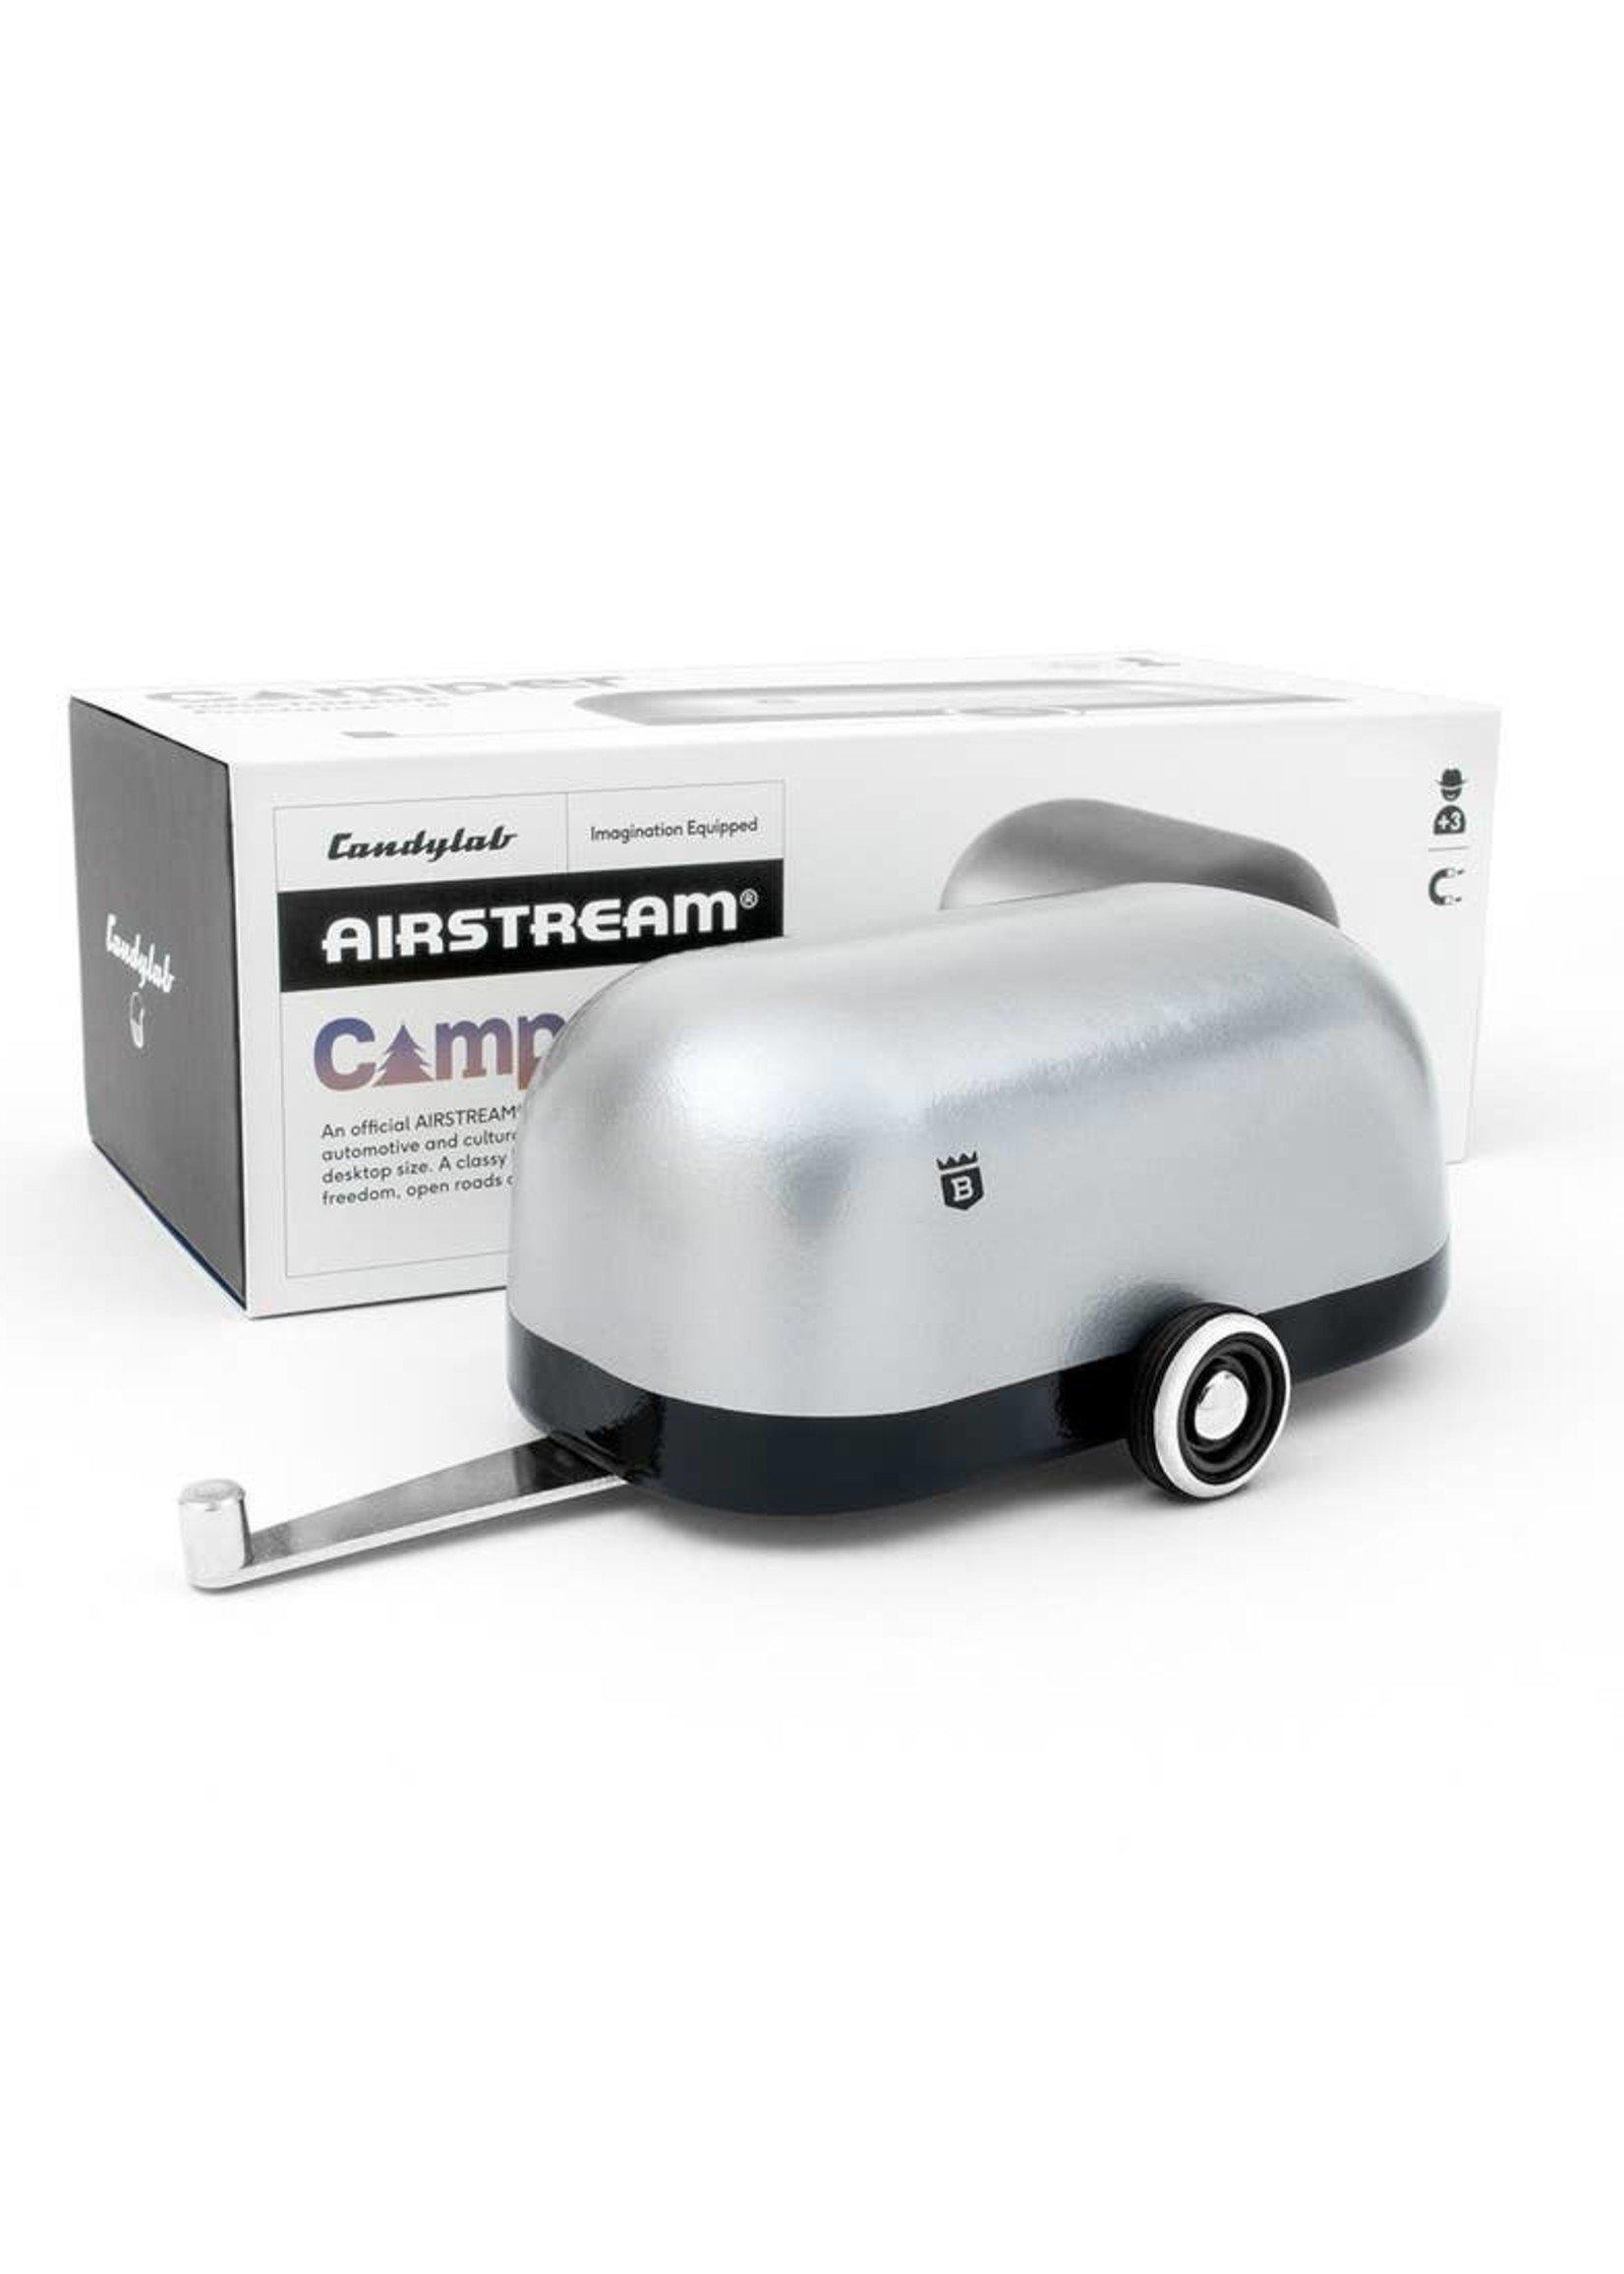 candylab Airstream Trailer